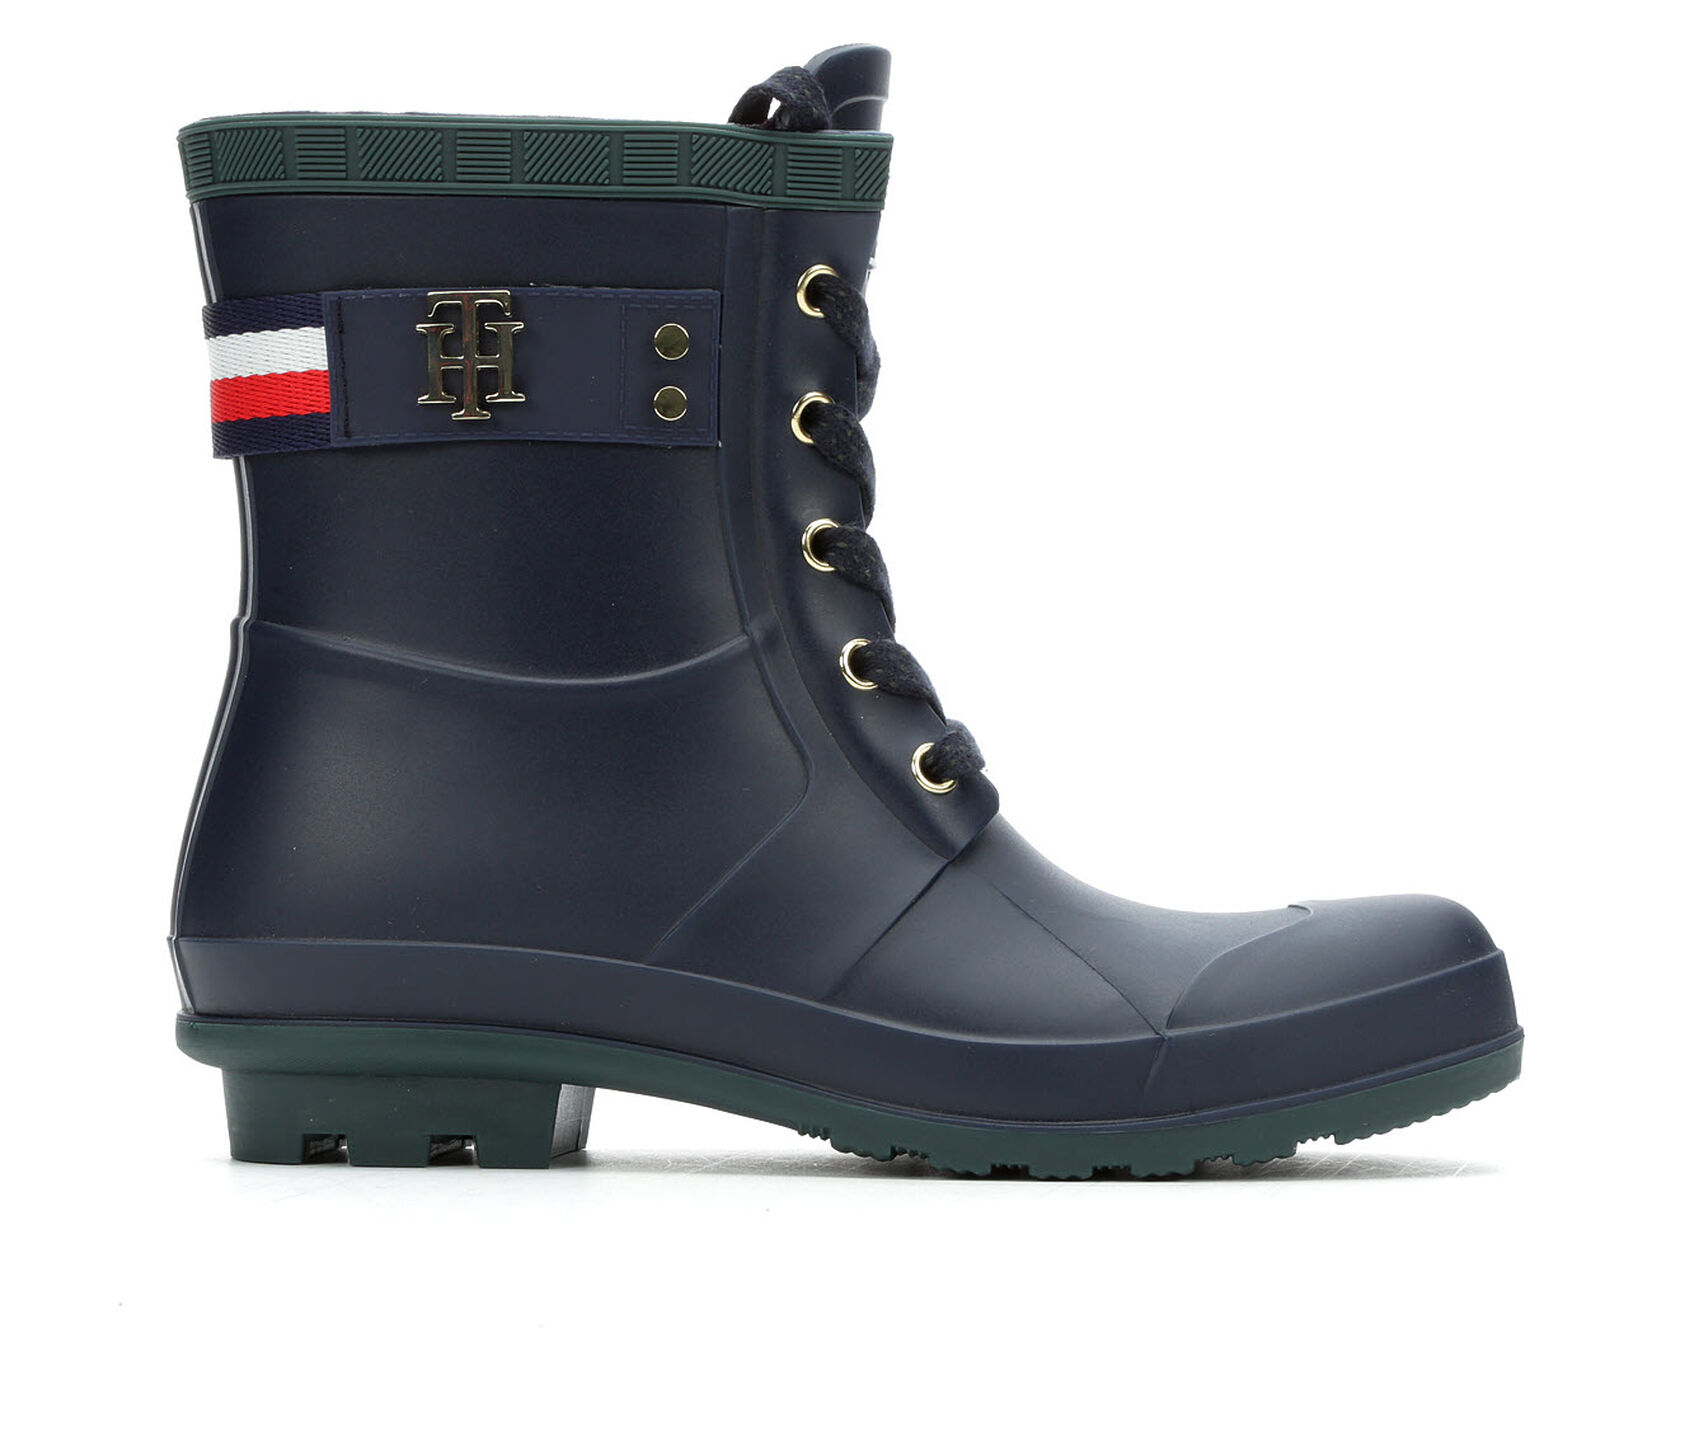 76cf633af19 Women's Tommy Hilfiger Toniee Rain Boots